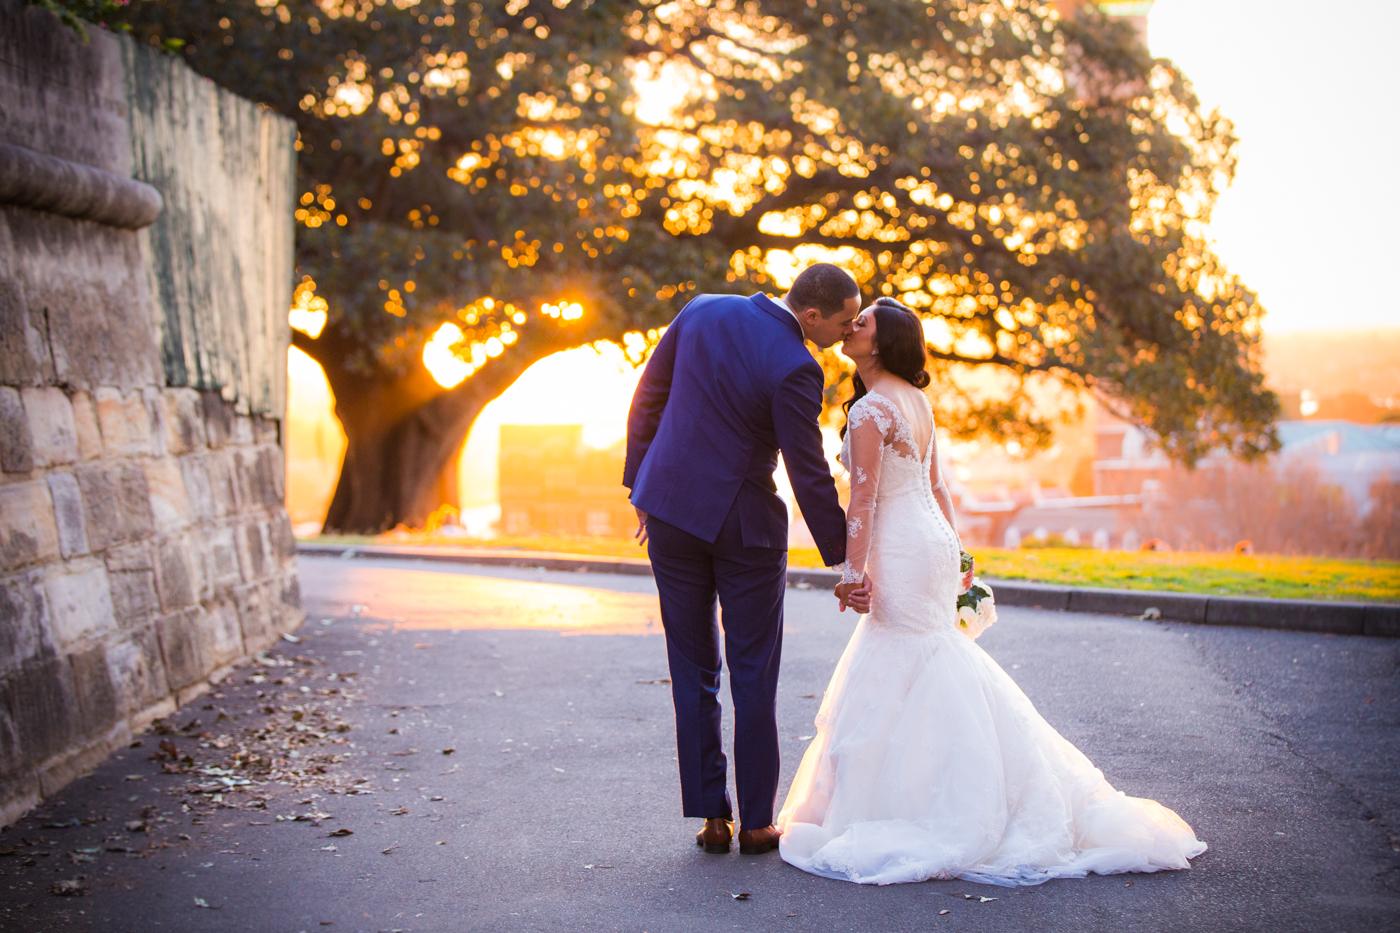 Affordable wedding photography Sydney